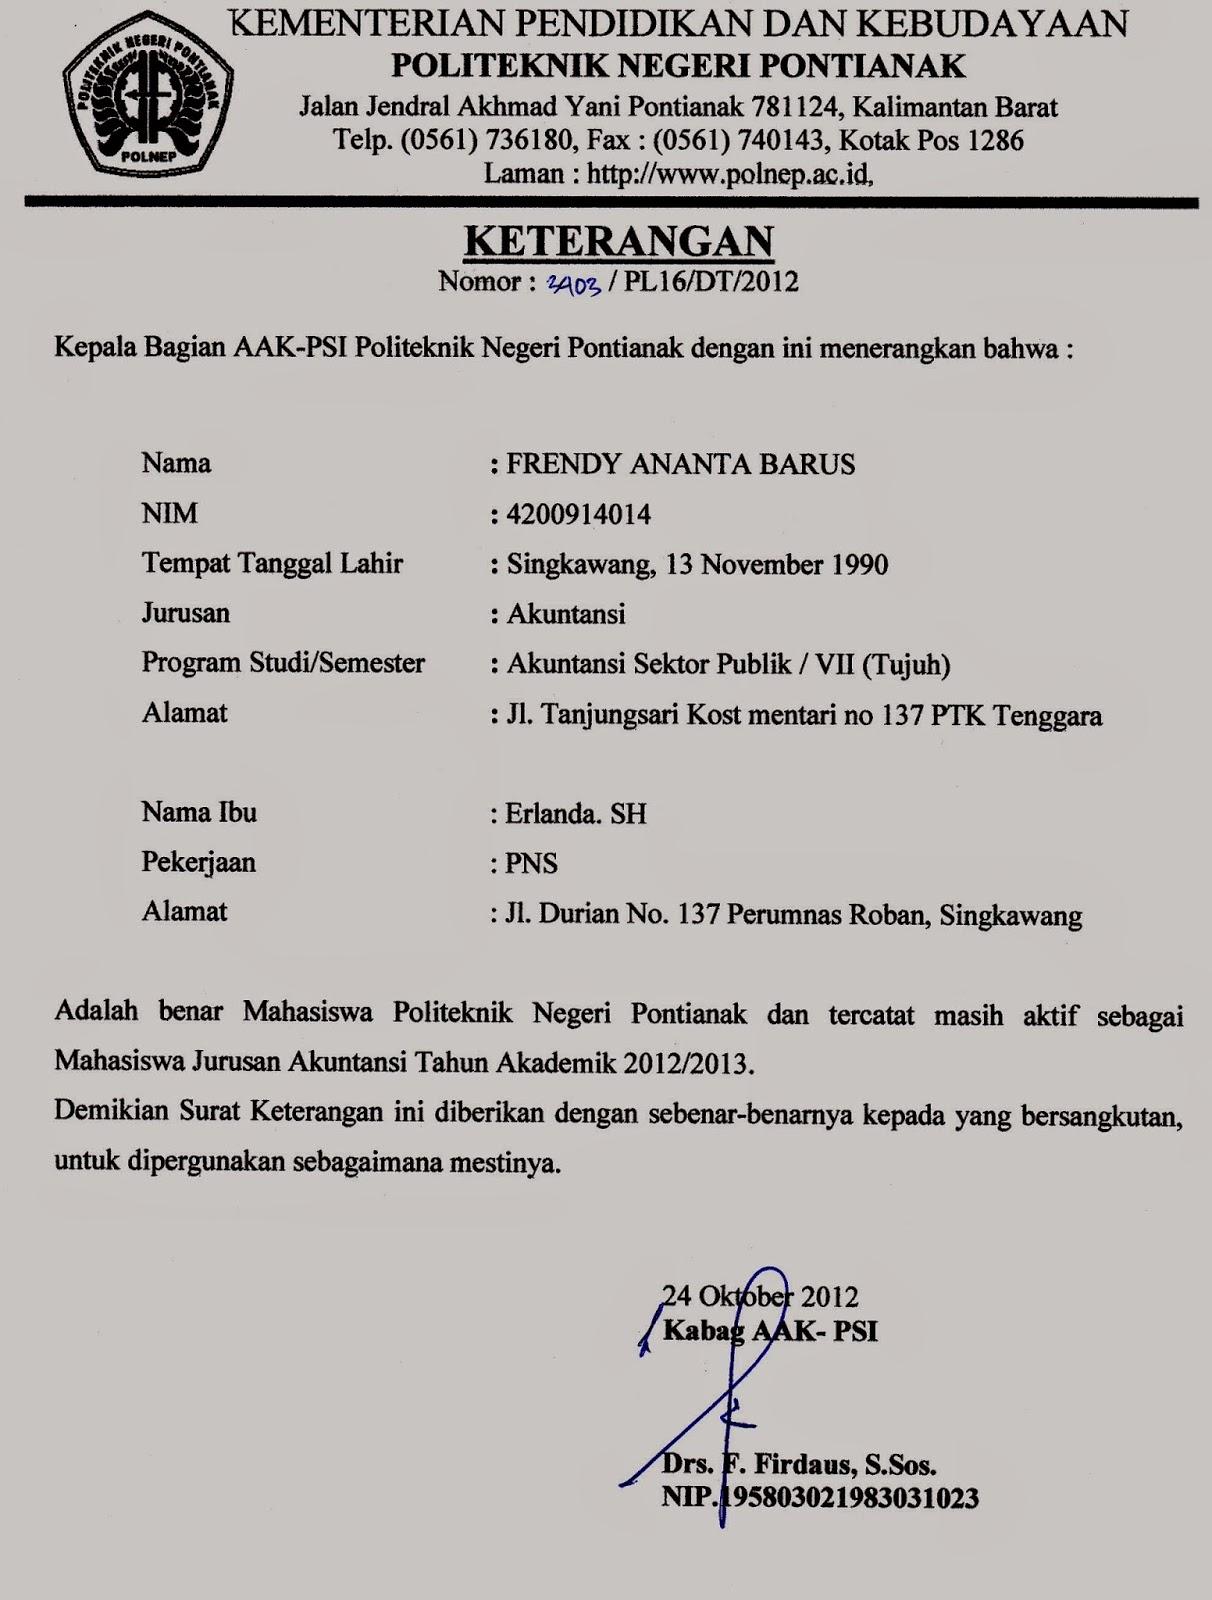 Surat Keterangan Aktif Kegiatan Organisasi April 2015 Contoh Surat